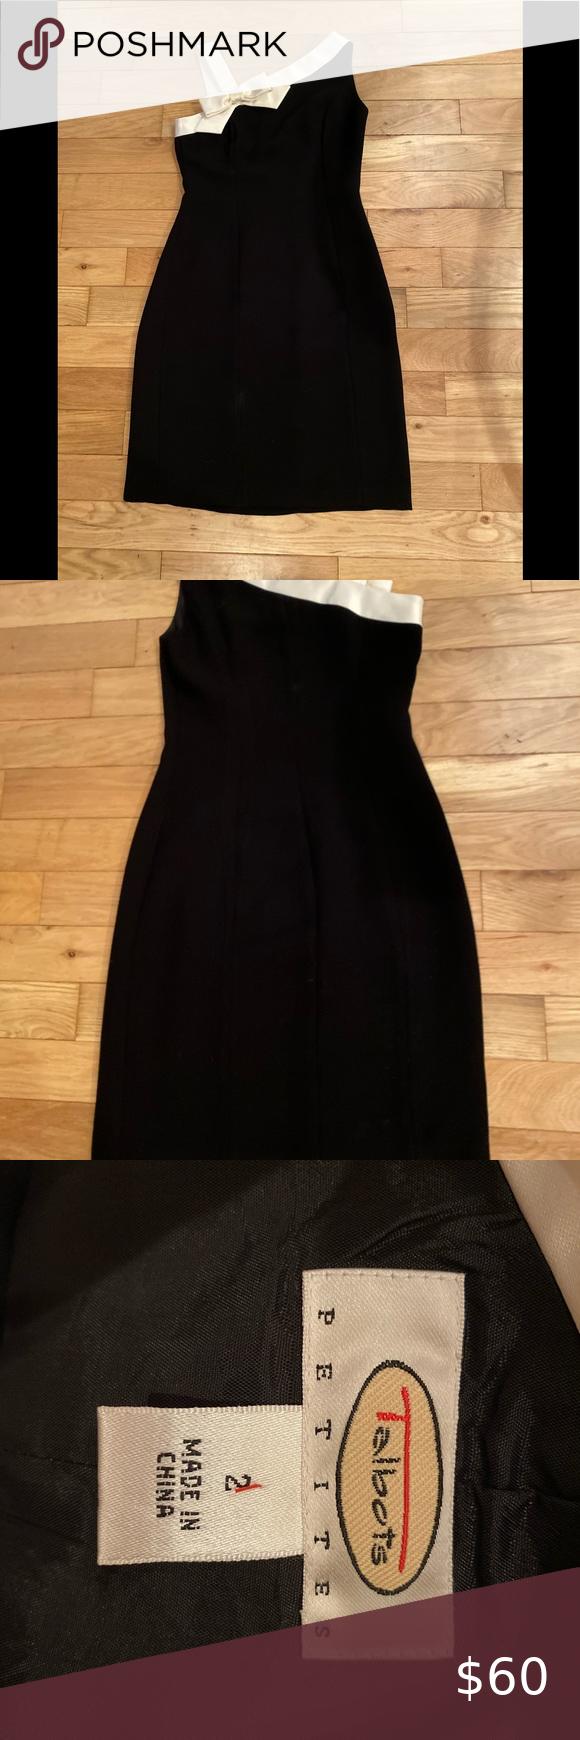 Talbots Cocktail Dress Size 2 Petites Plaid Dress Vintage Flare Dress Work Black Sleeveless Midi Dress [ 1740 x 580 Pixel ]